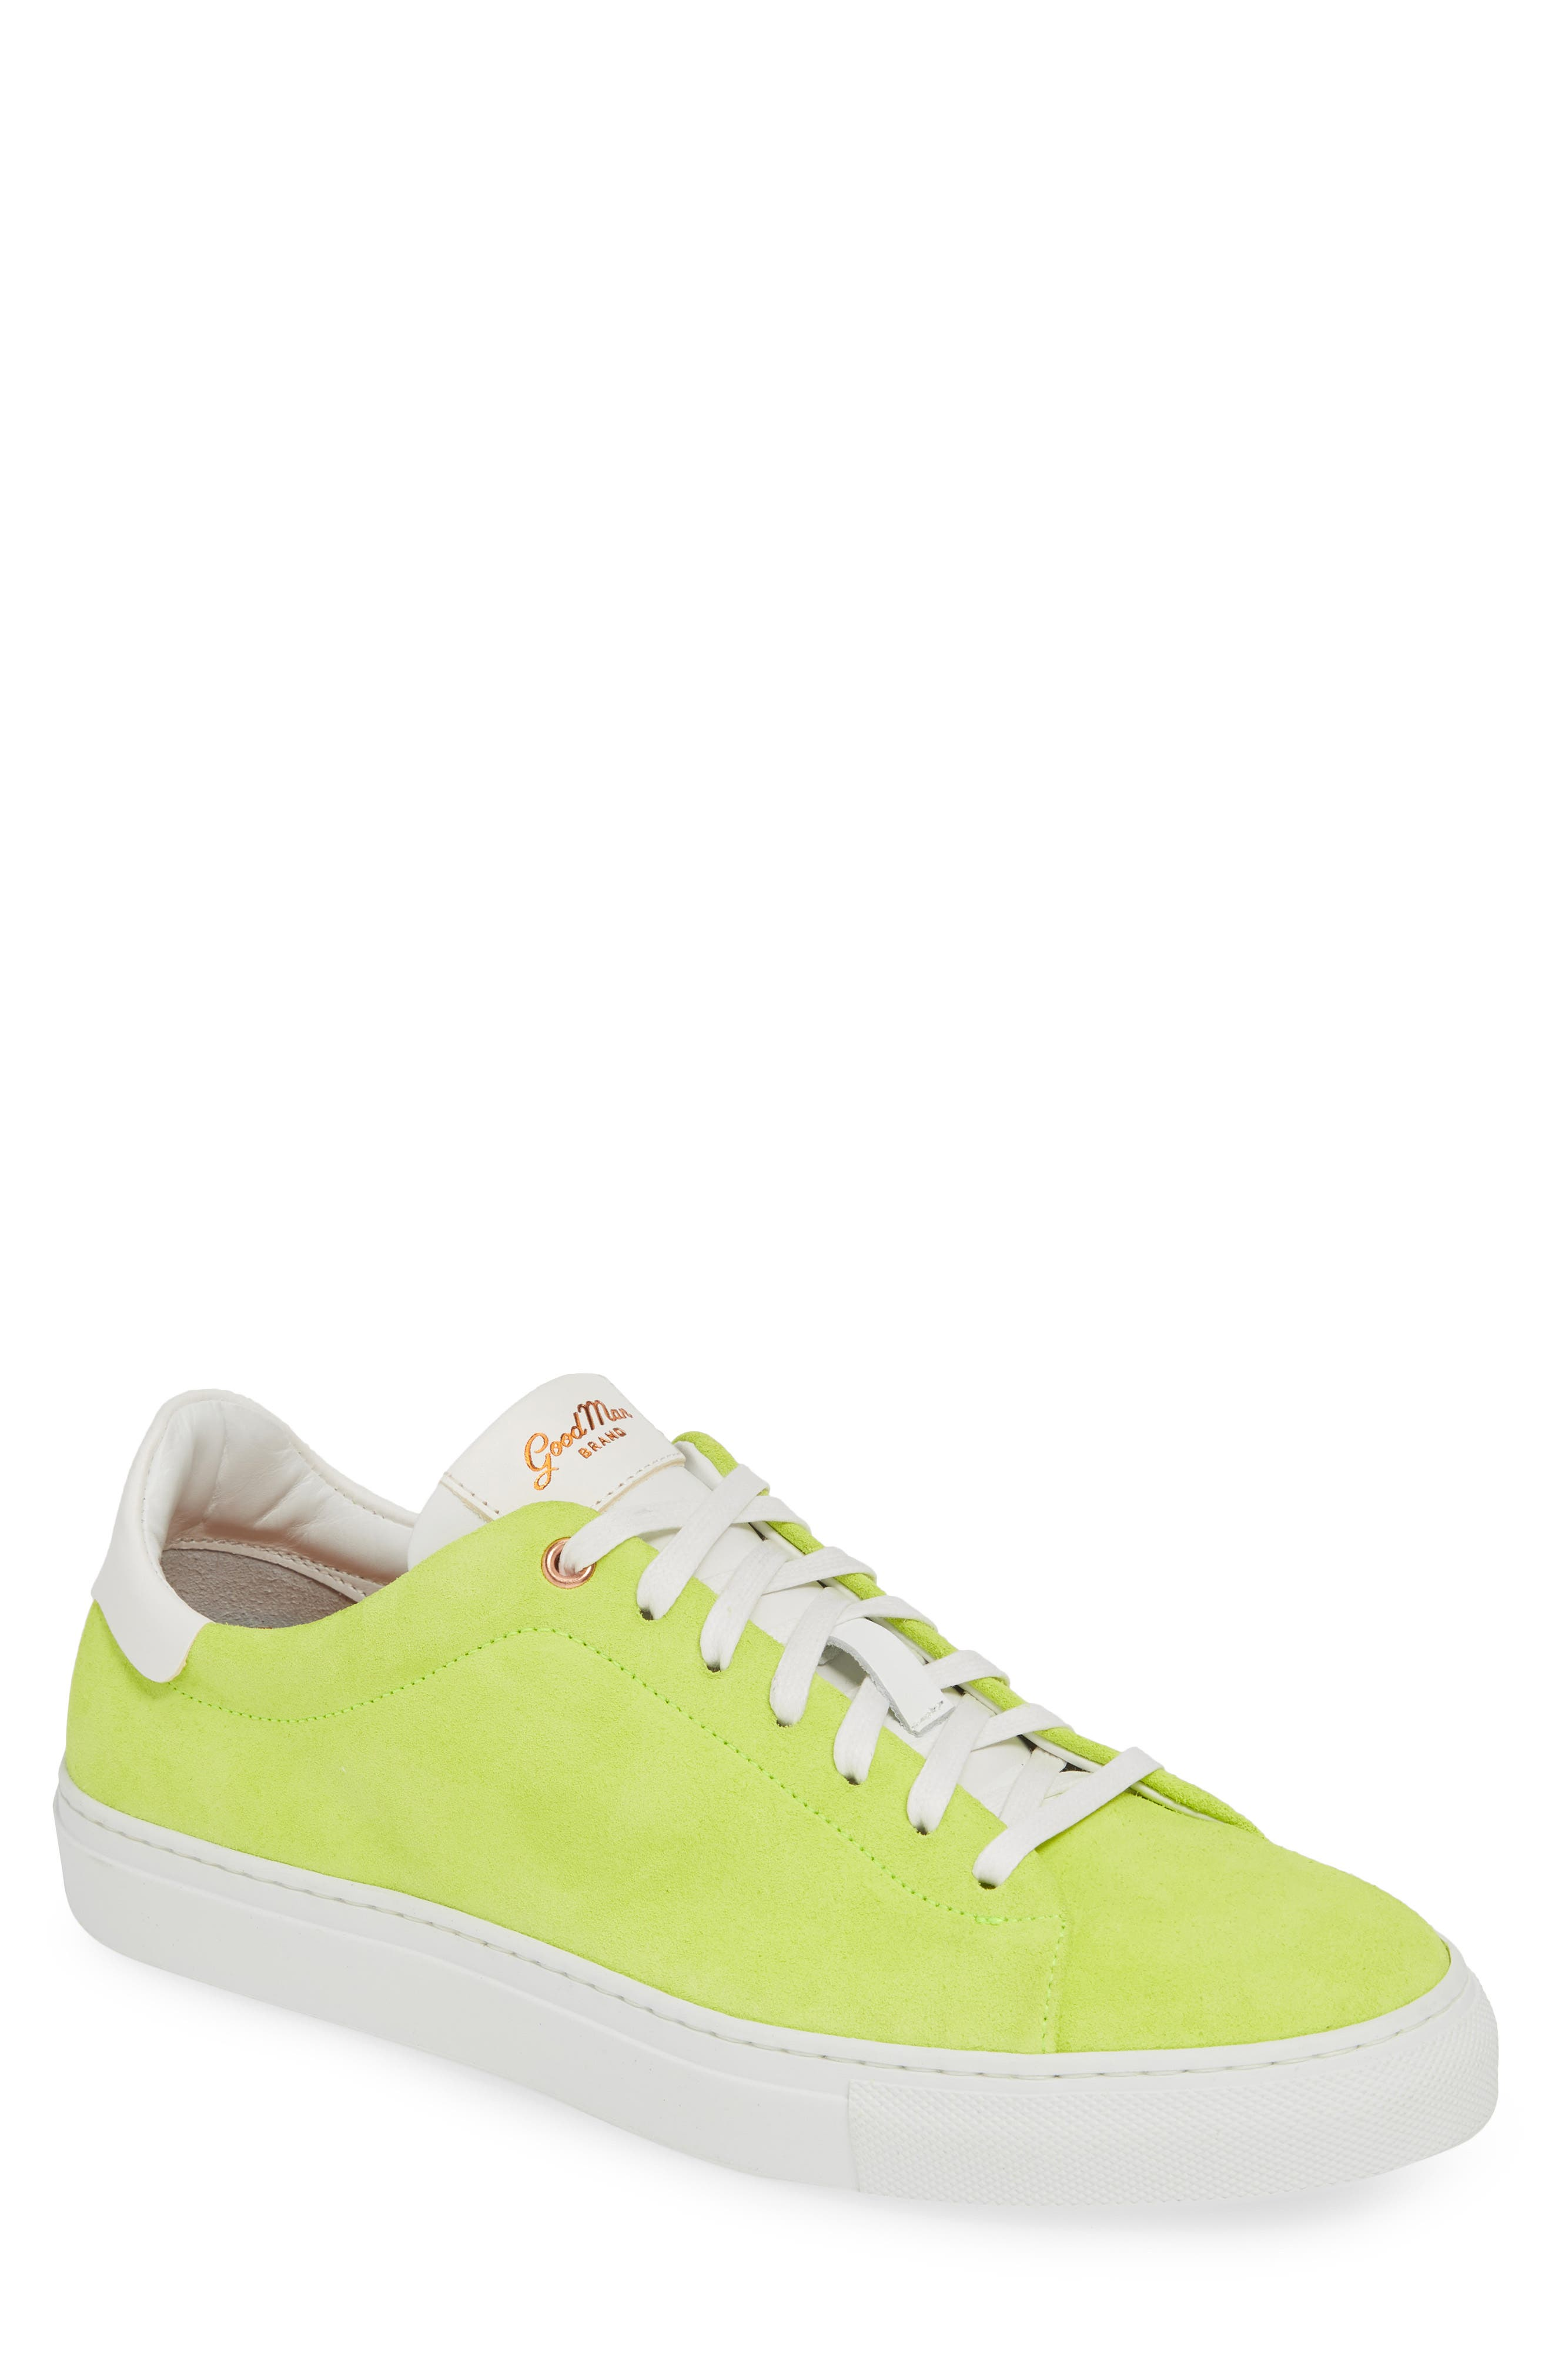 2a6702cd98d Men s Good Man Brand Shoes